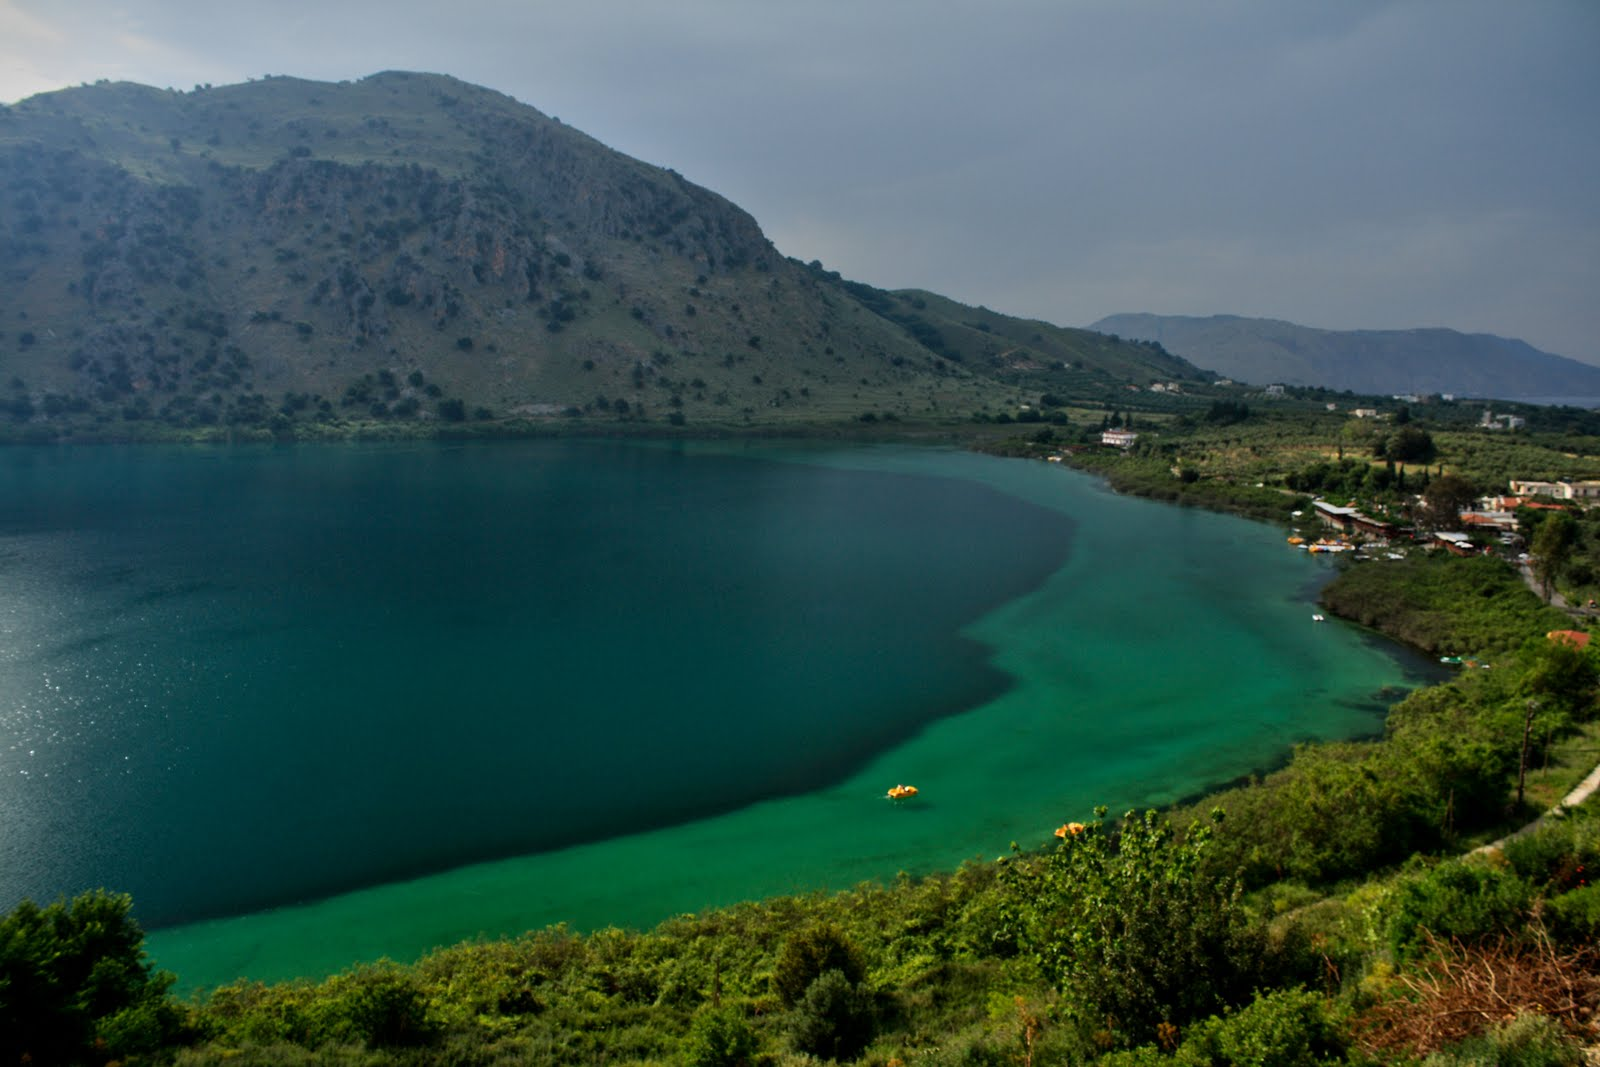 Villa Lambros - Kournas lake